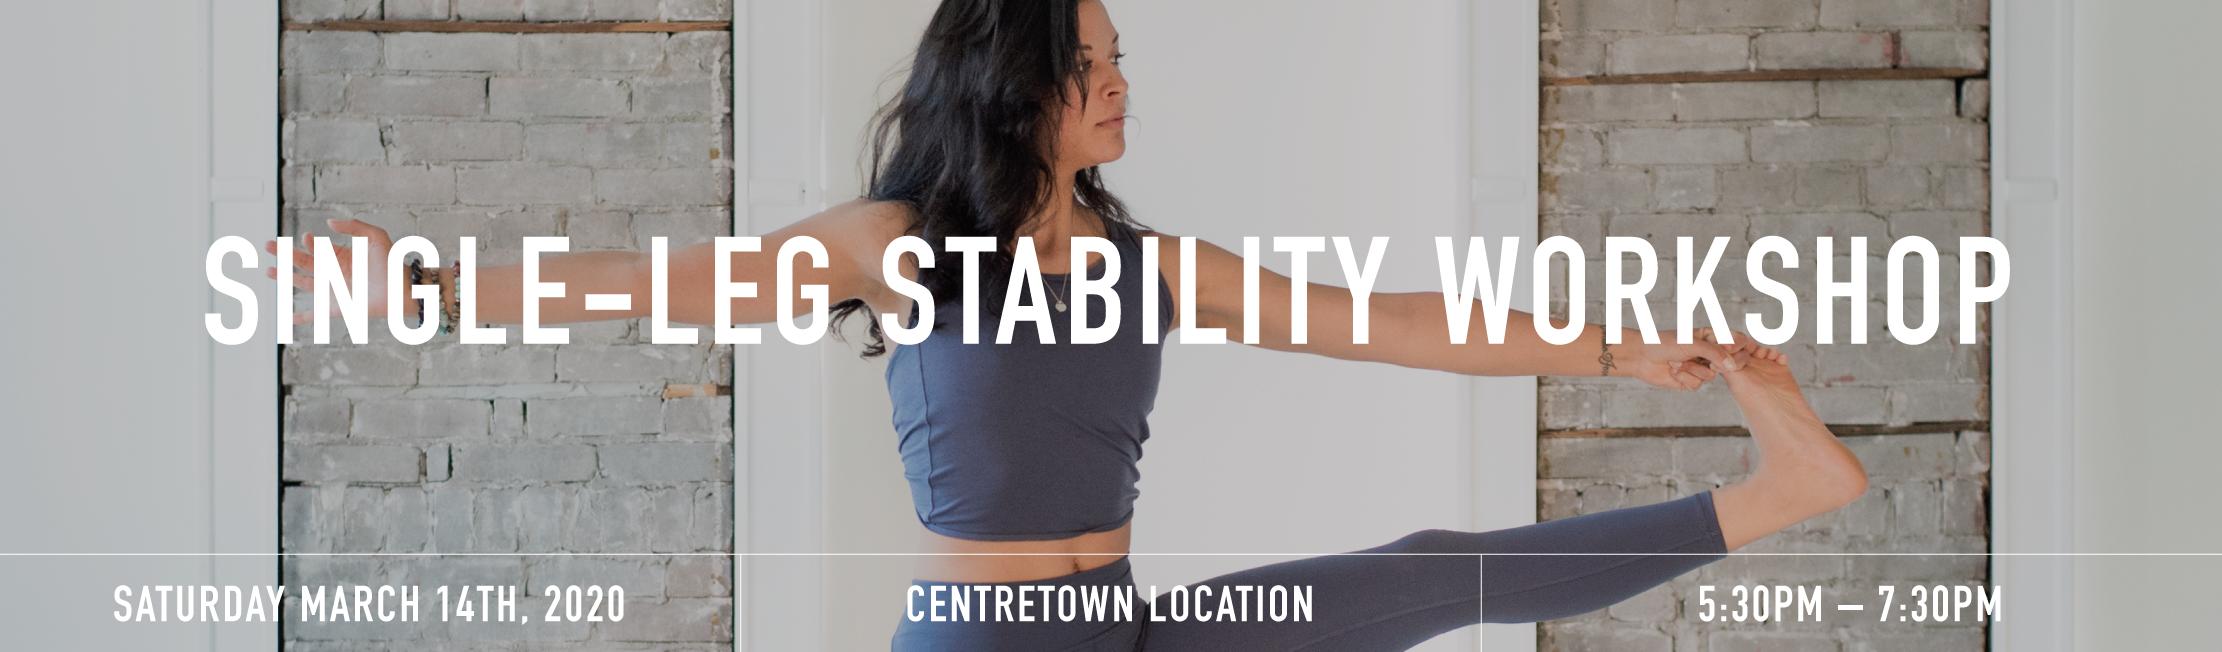 Single leg stability banner